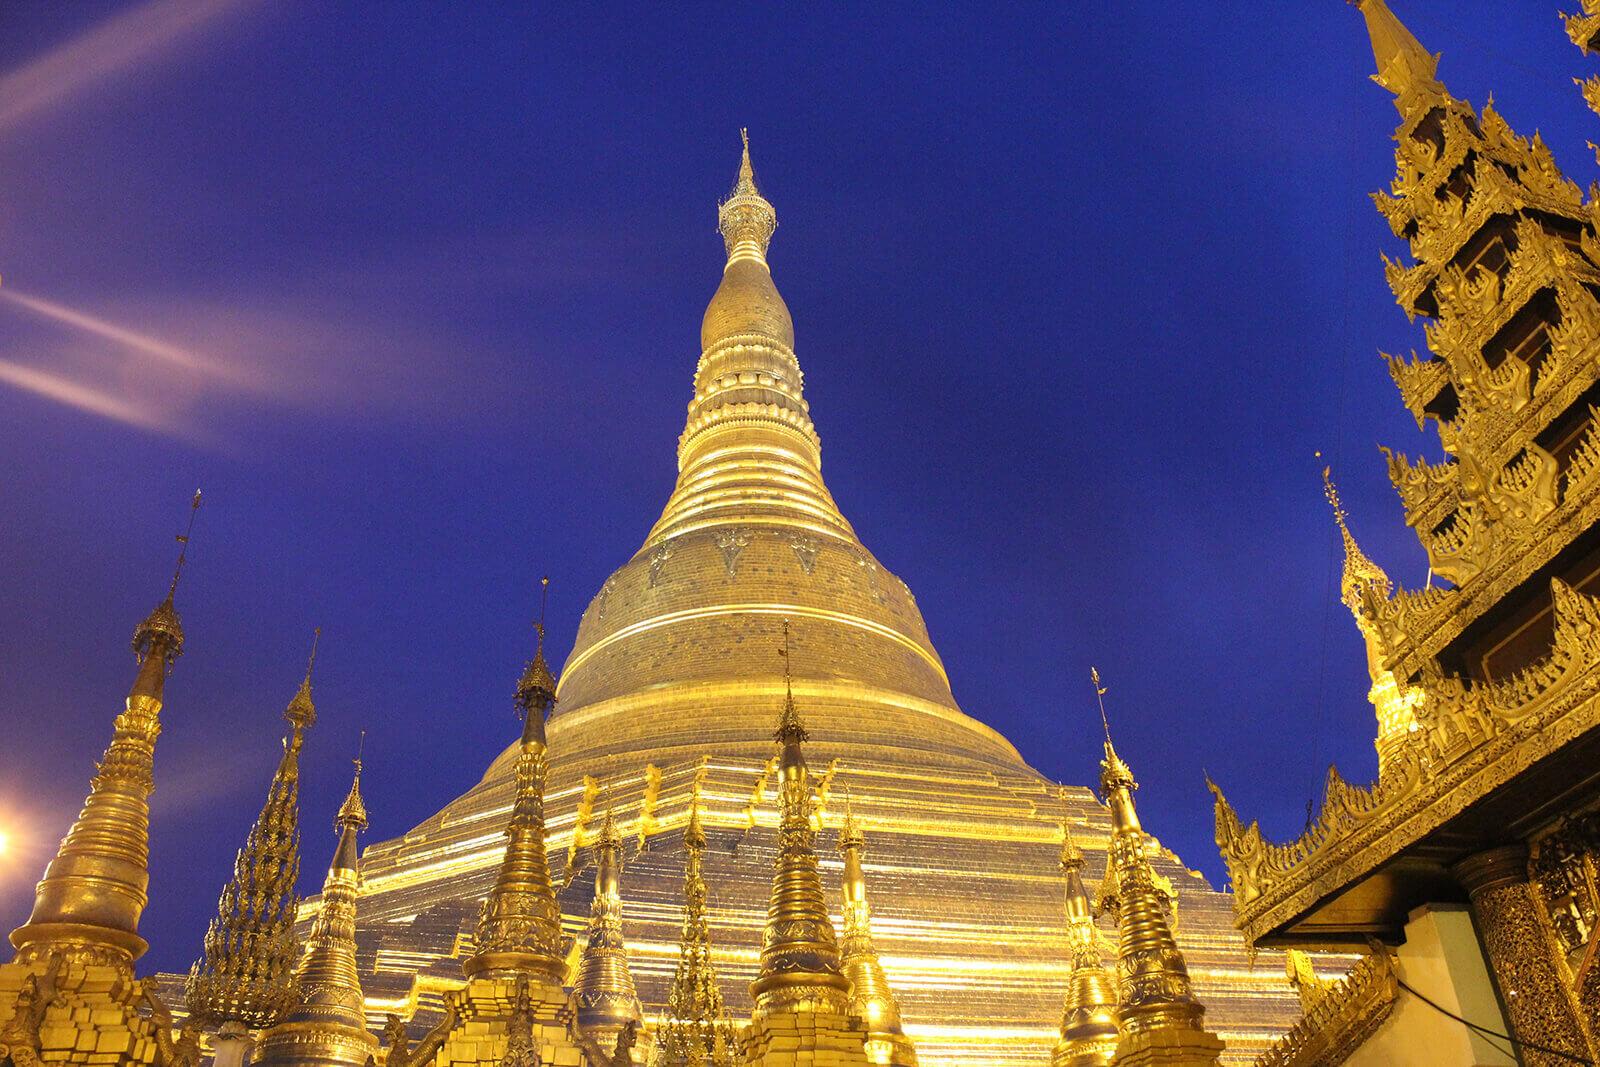 Shwedagon Pagoda in Yangon, Myanmar, also known as the Great Dagon Pagoda and the Golden Pagoda